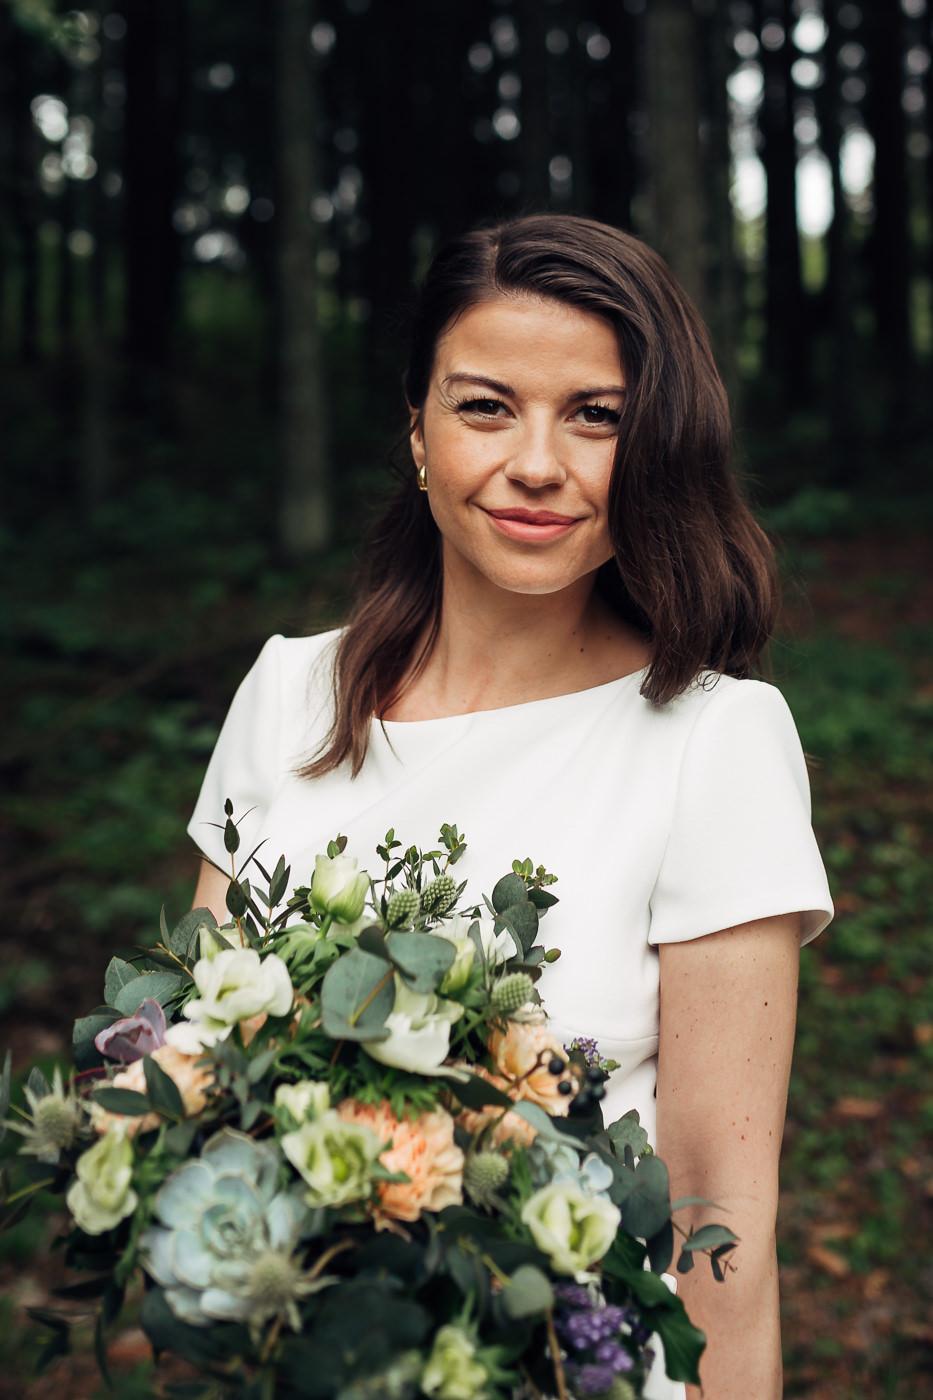 Malene & Ole Martin - elegant dansk- norskt bryllup i Oslo Bryllup Gamle Aker Oslo 37 Akershus